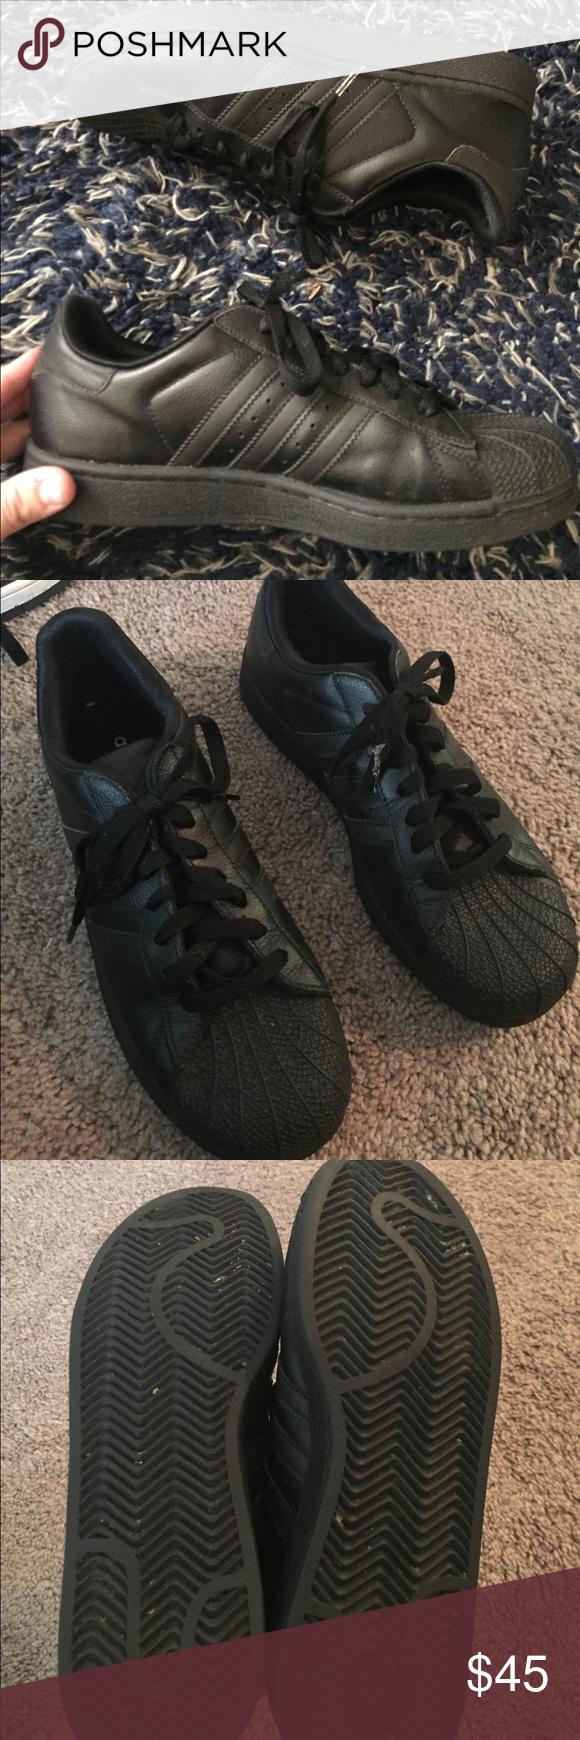 nero superstar adidas scarpe adidas scarpe, scarpe e lacing